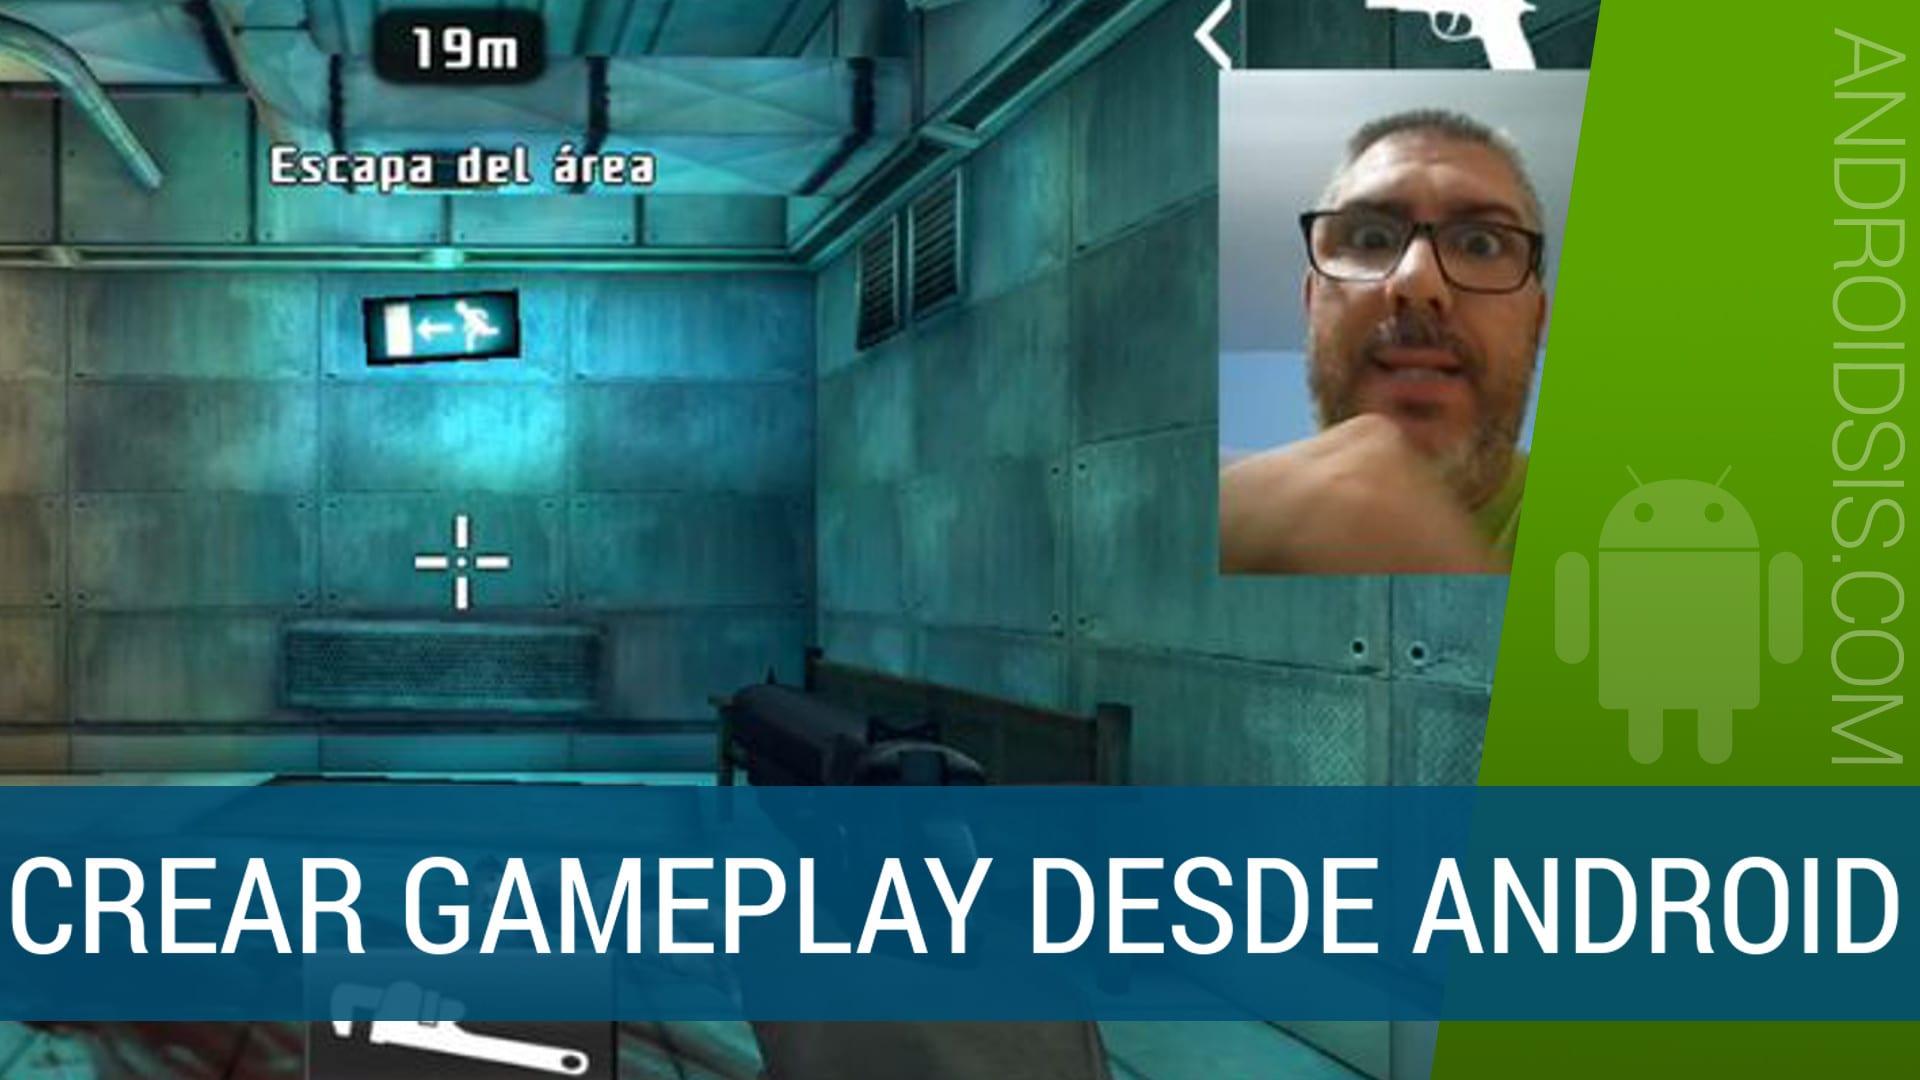 Crear Gameplay desde Android paso a paso